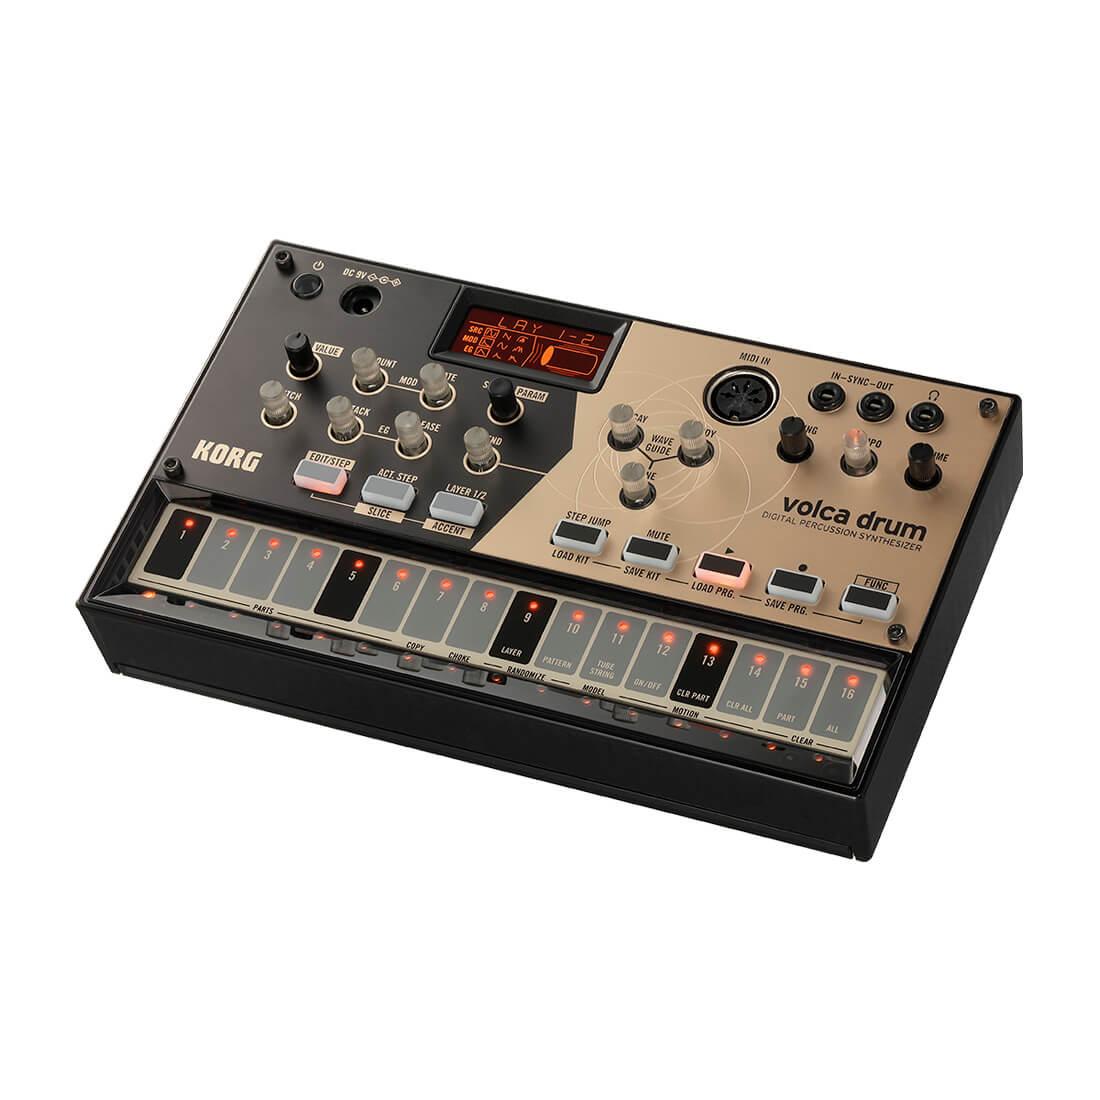 Korg Volca Drum perkusjon-synthesizer